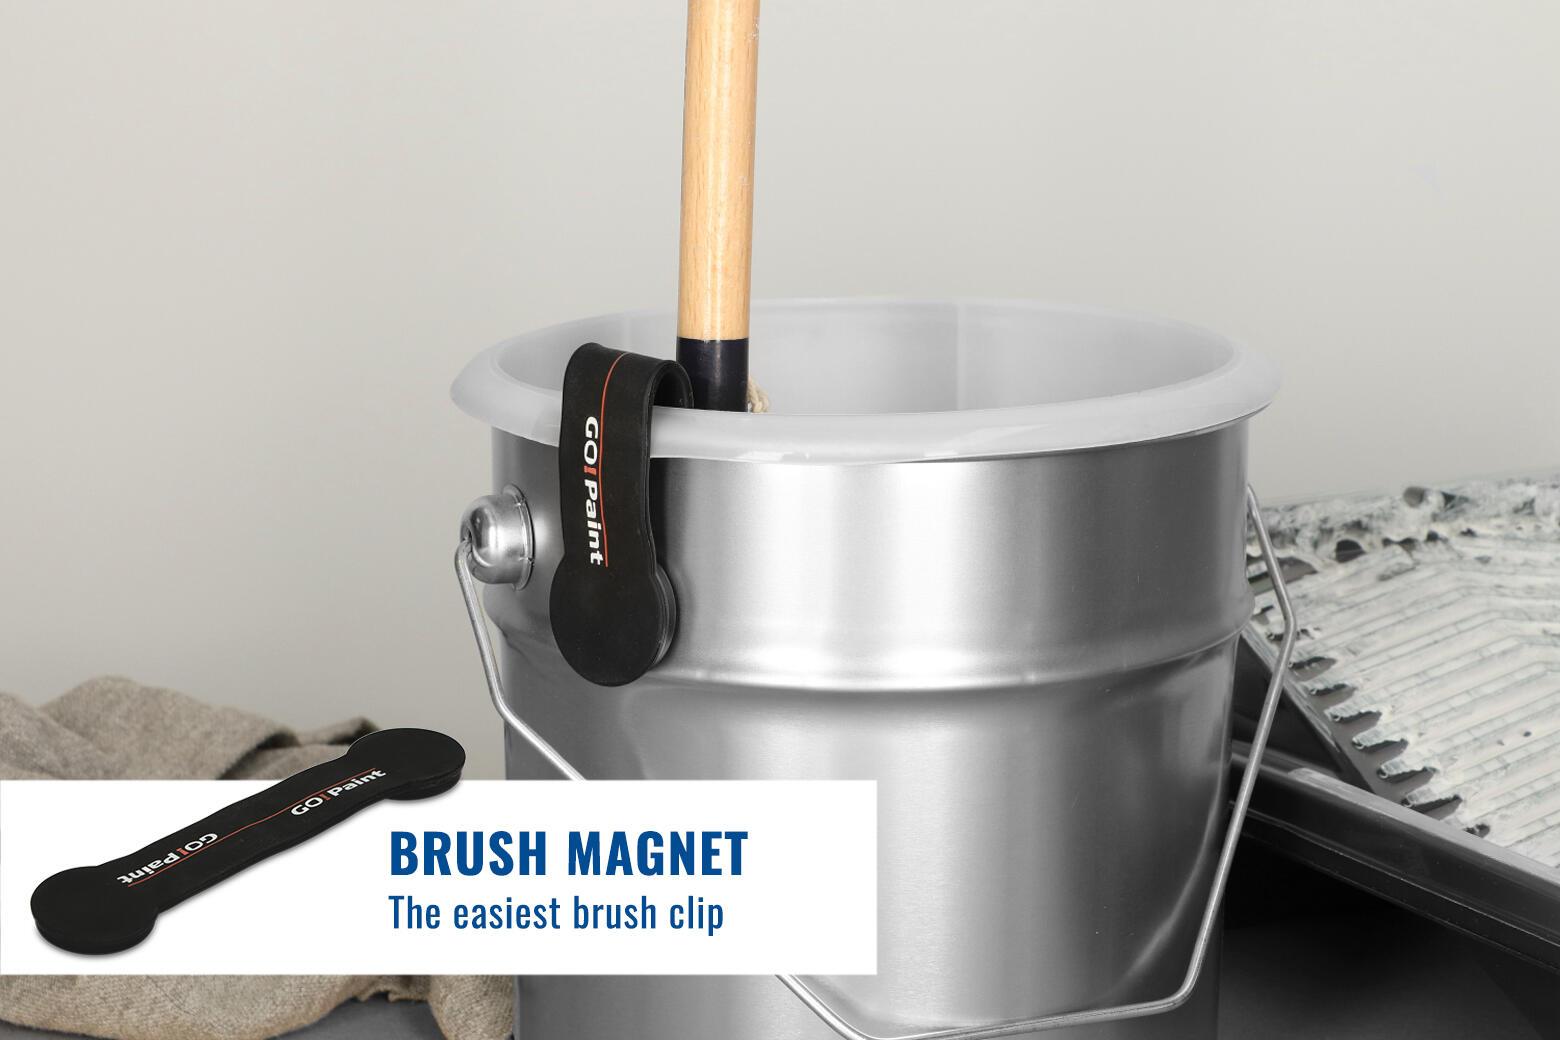 Flexible magnetic brush clip